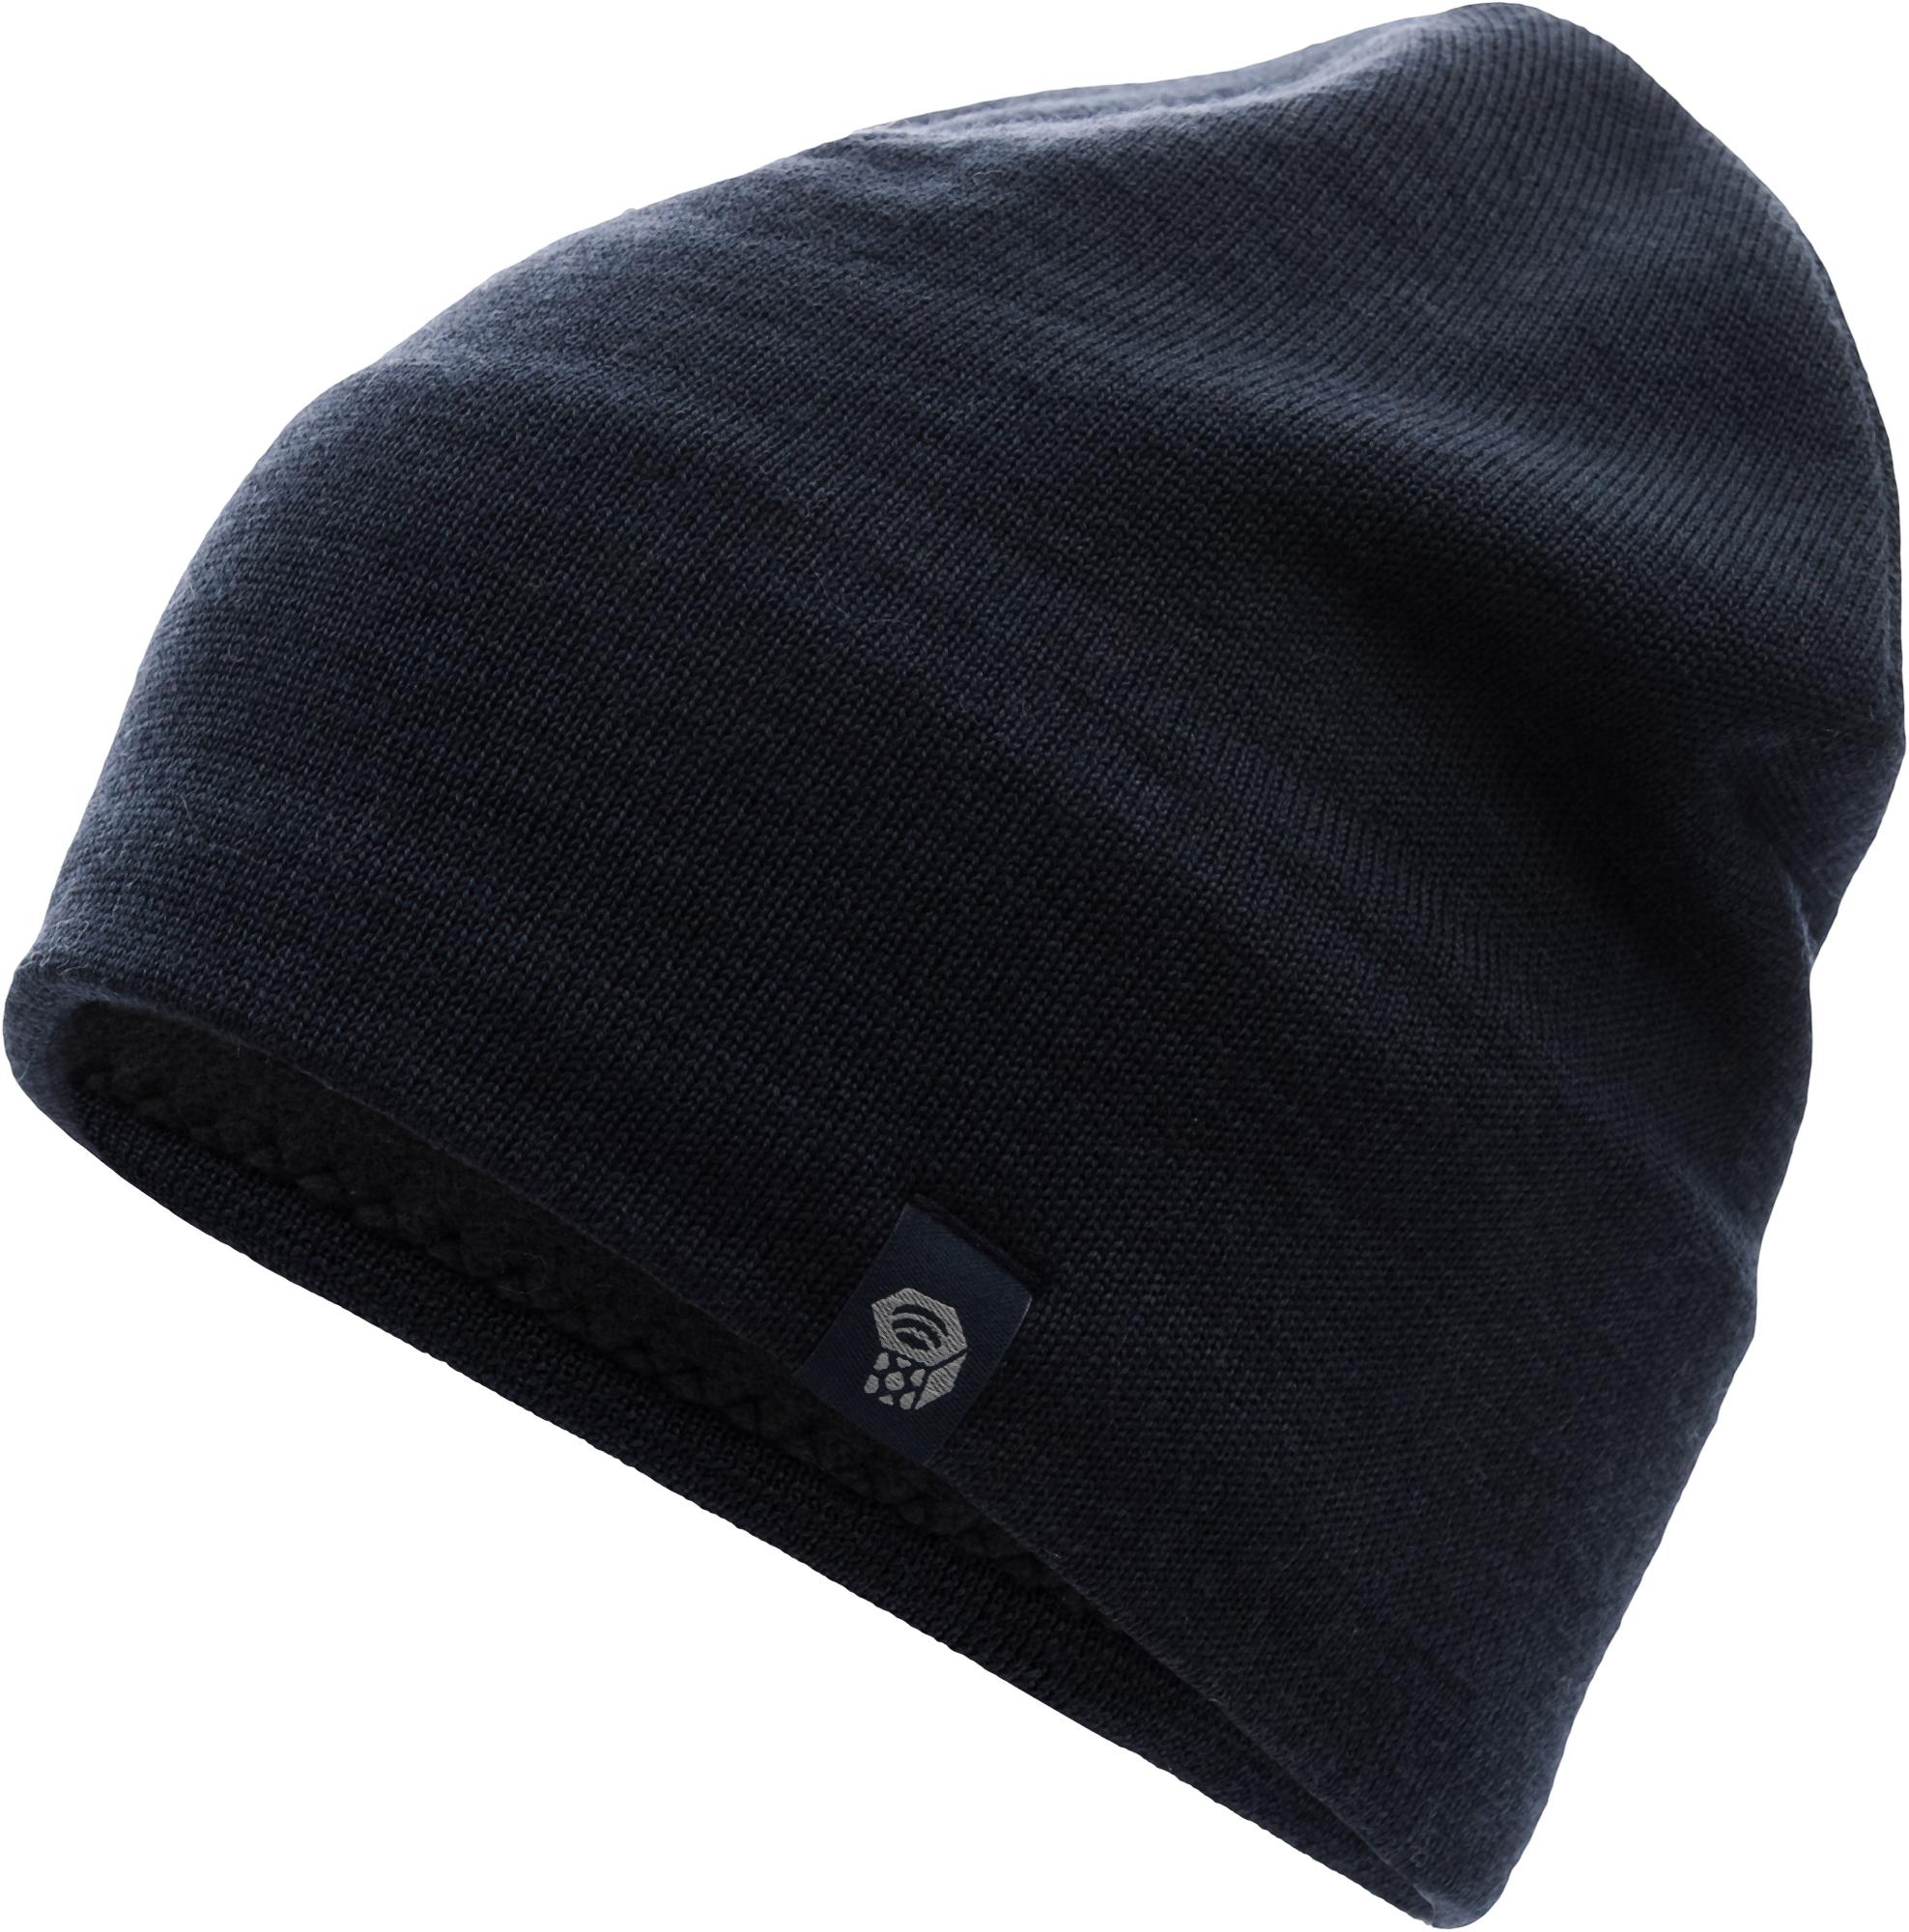 Mountain Hardwear Шапка мужская Mountain Hardwear Caelum™ Dome, размер 46-48 цена